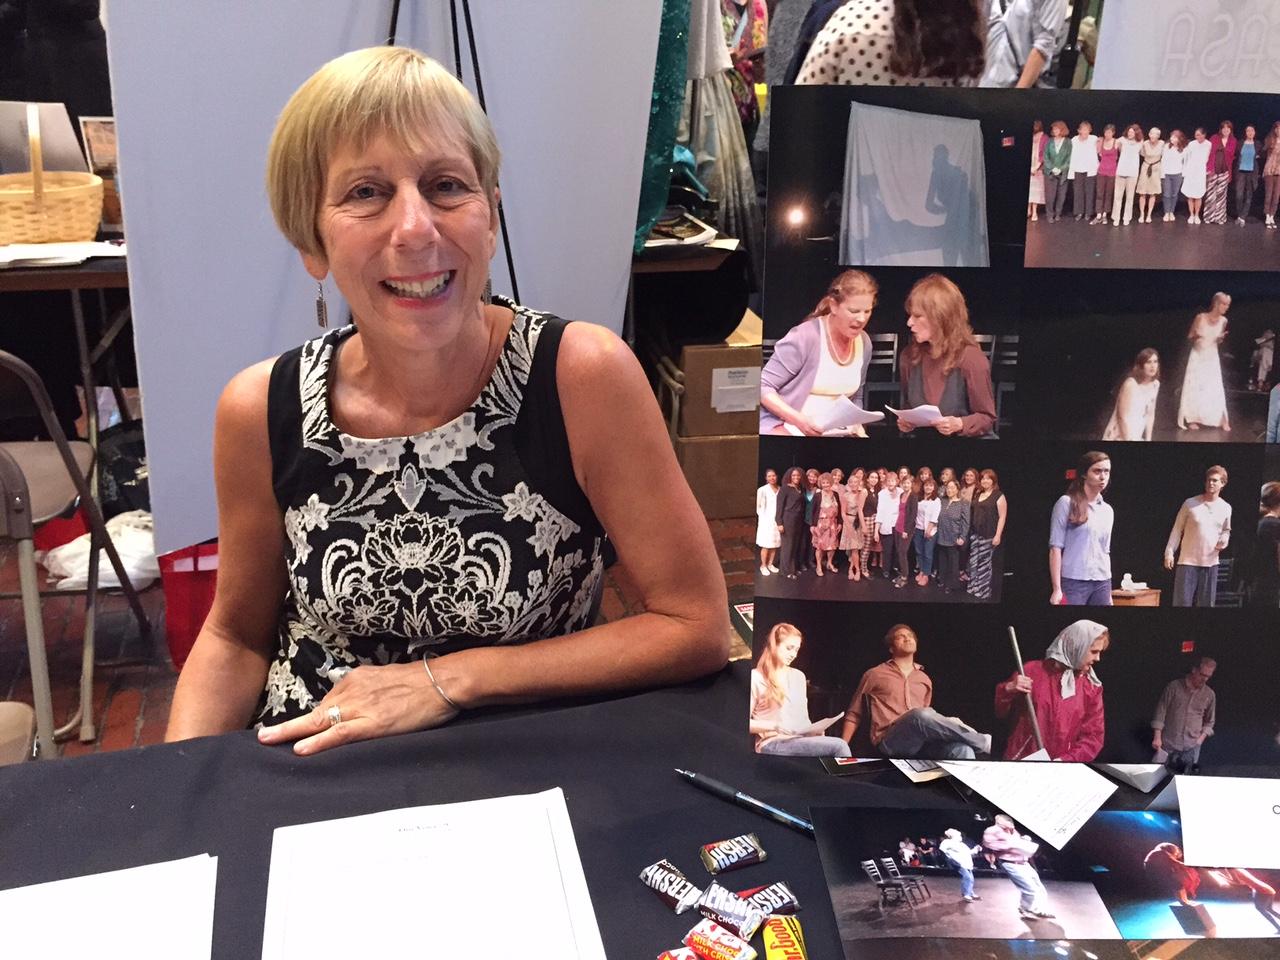 Kelly at THEATRE EXPO 2015 copy